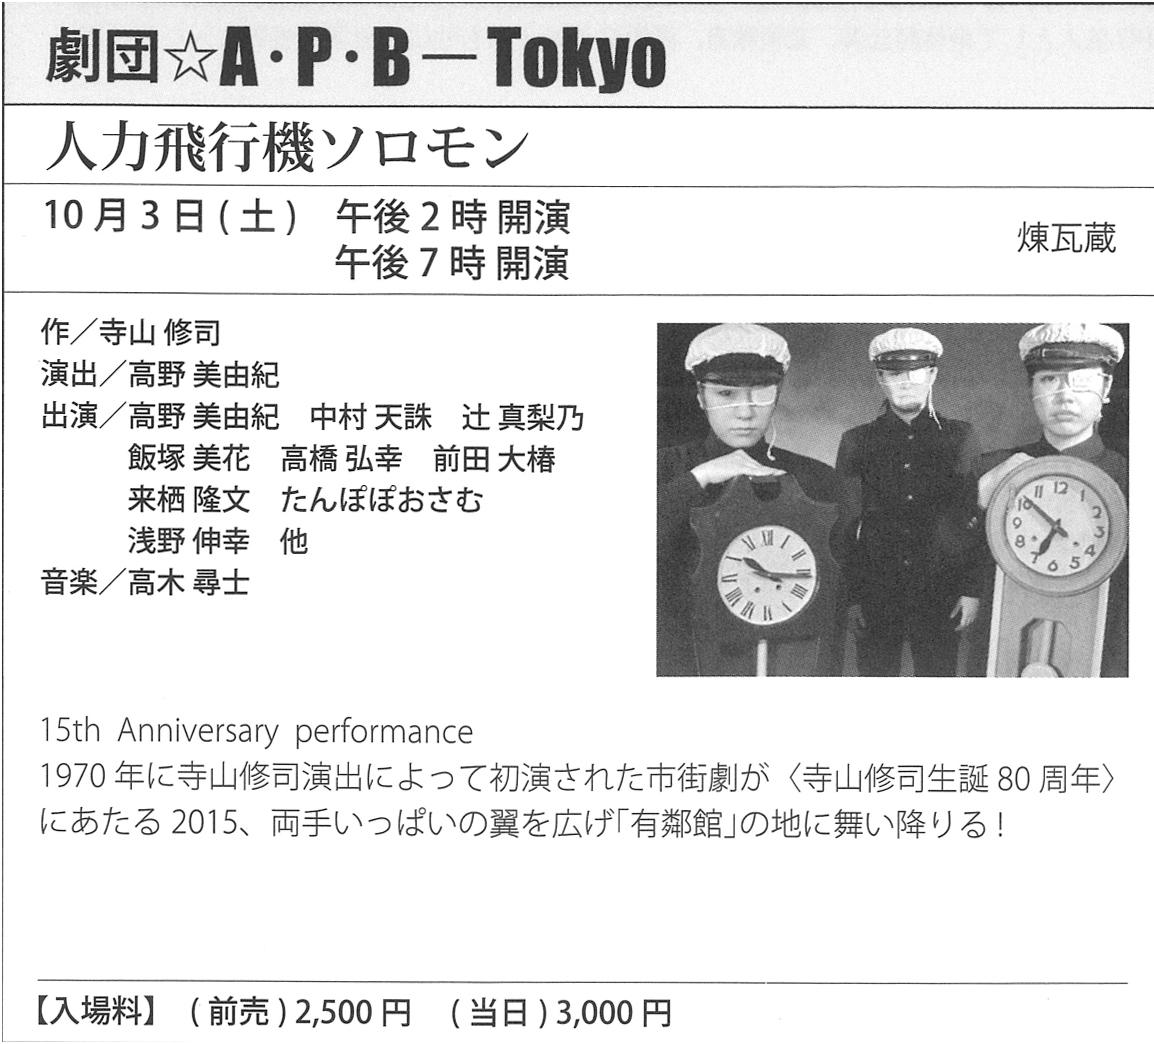 劇団☆A・P・BーTokyo 10/3